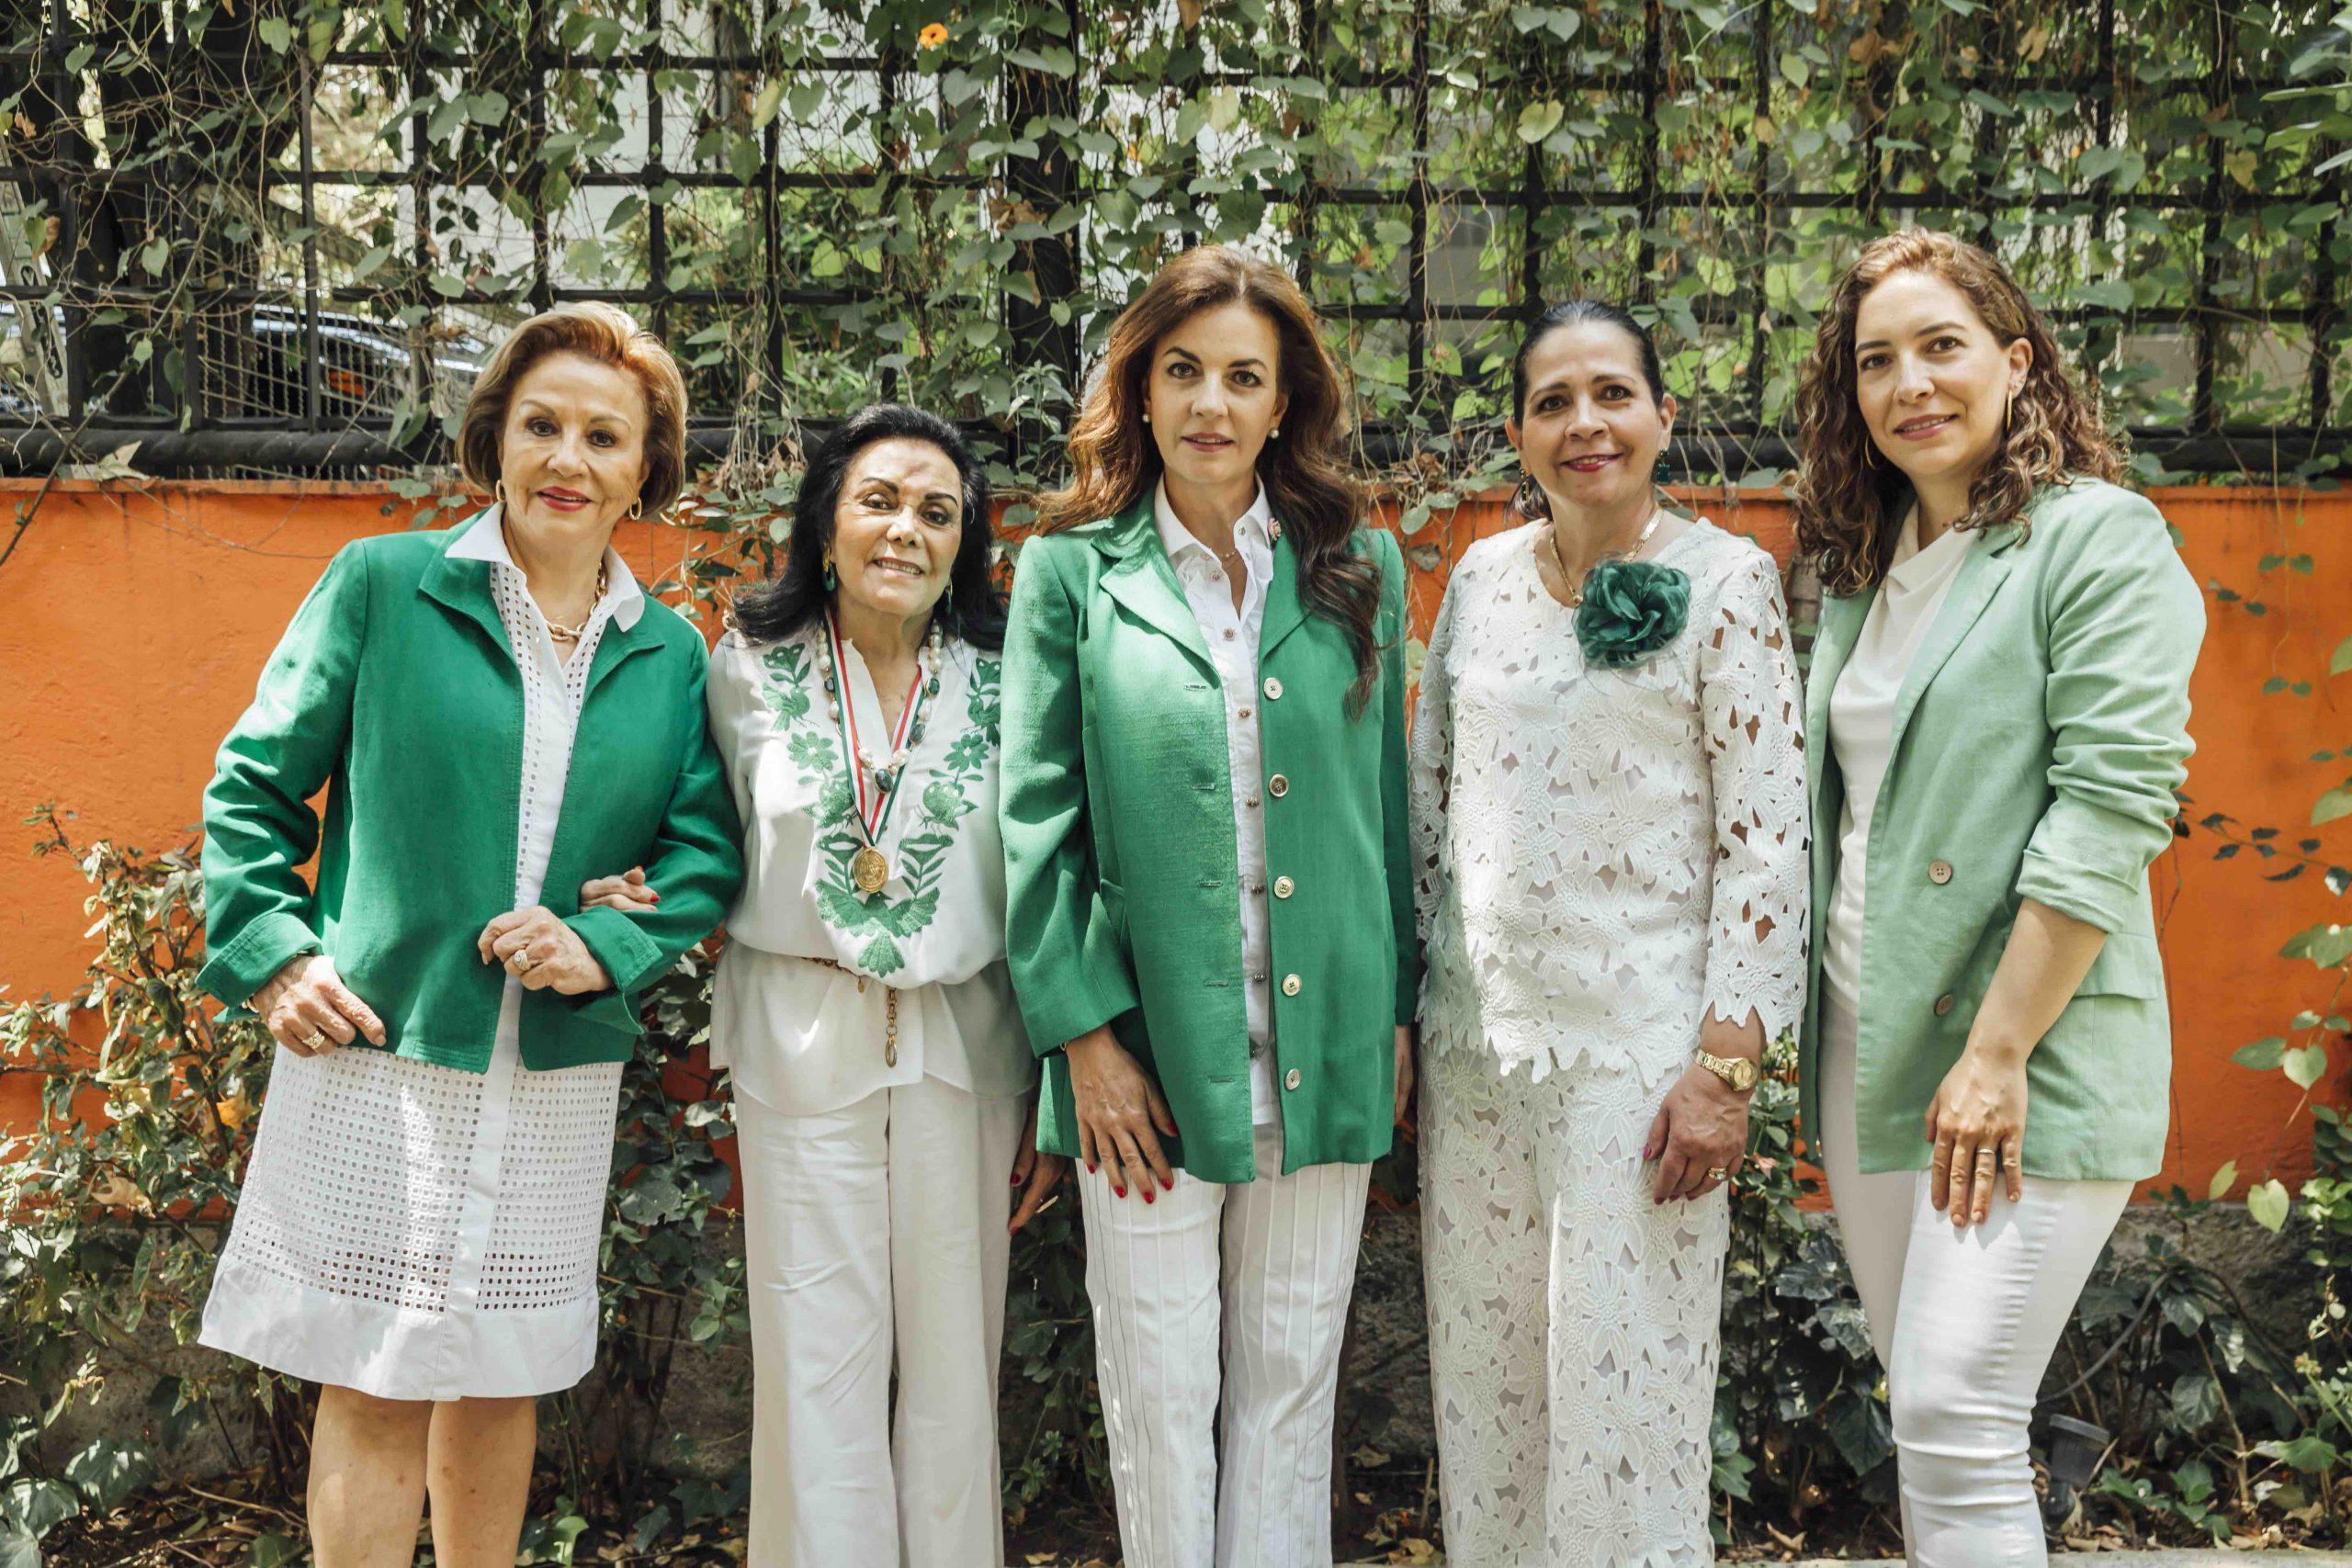 Chayo Sandoval, Silvia Rojo Lugo, Tere Cabal, Rosita Cardín y Cristina Vila